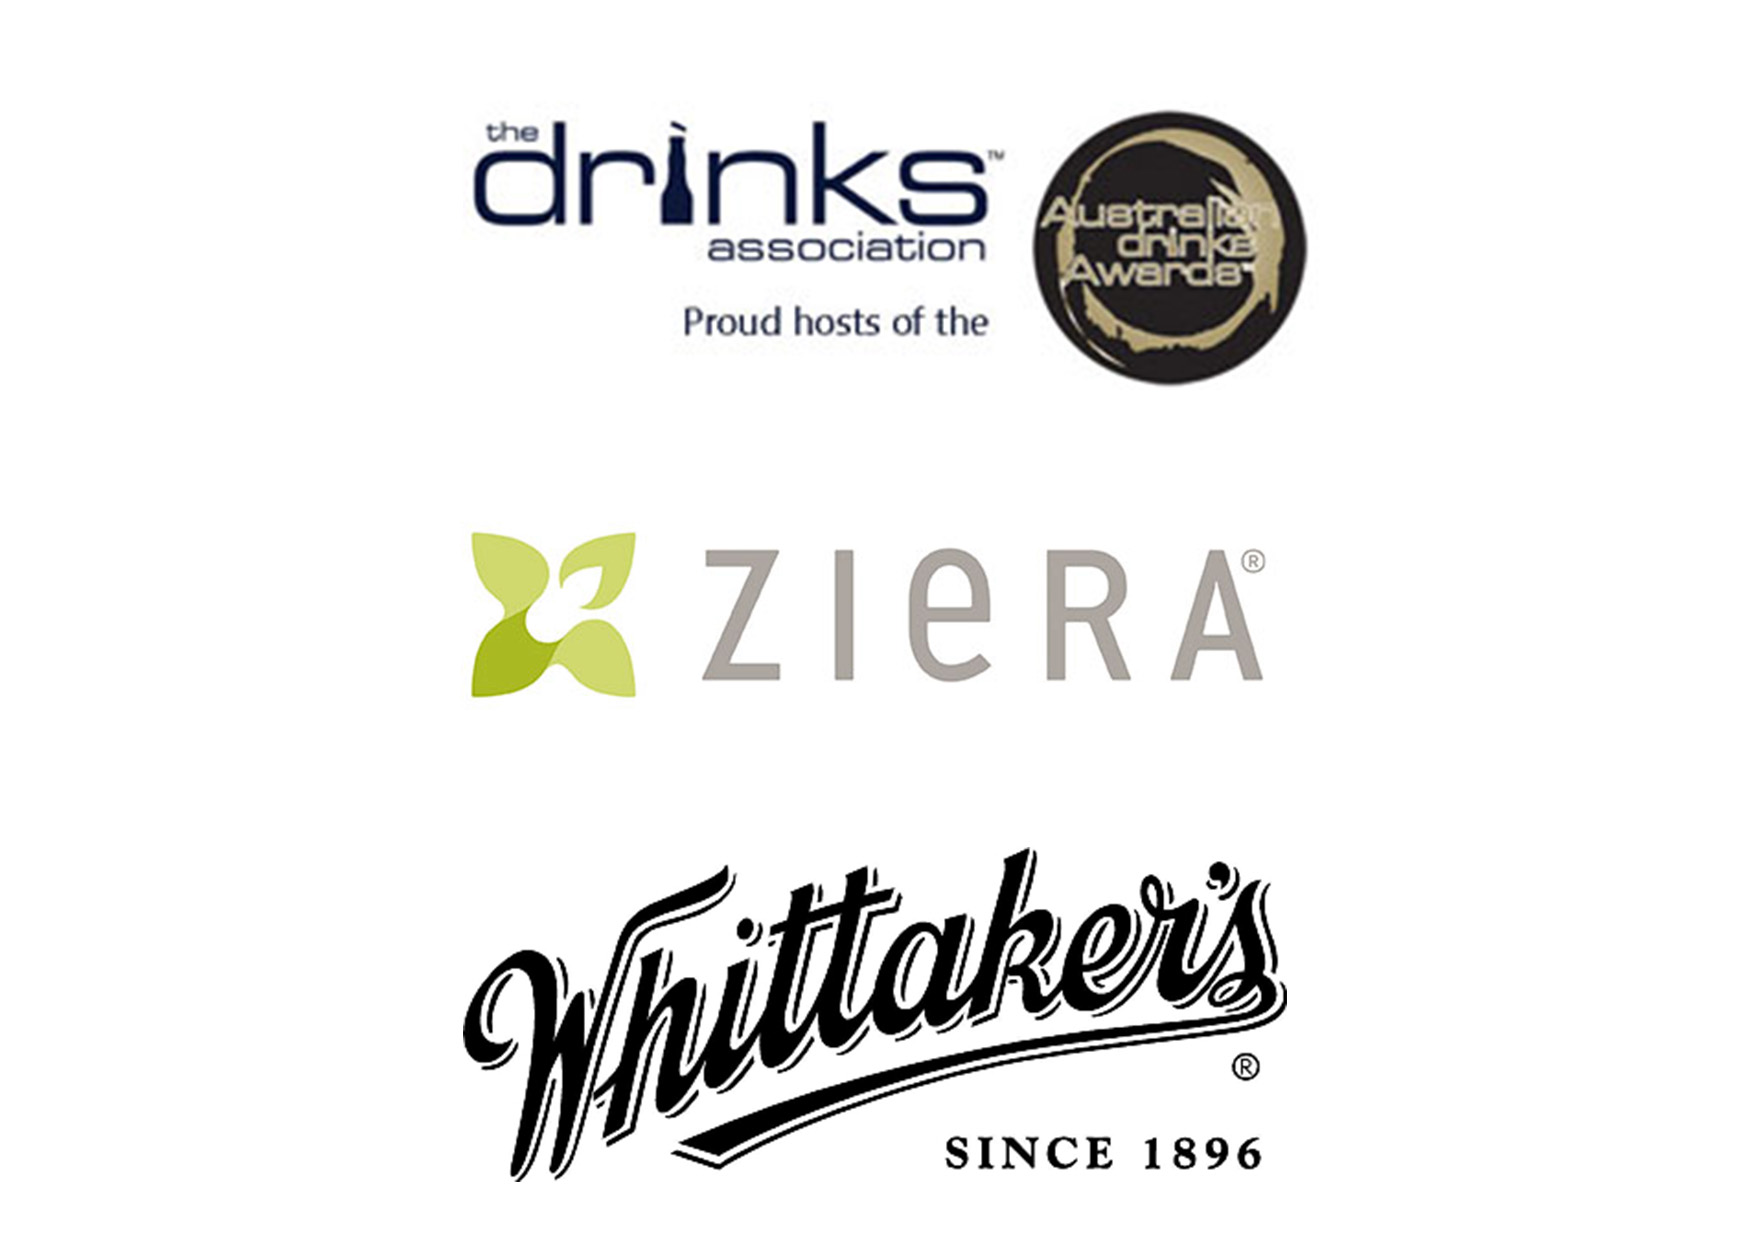 sponsors vip bubbles